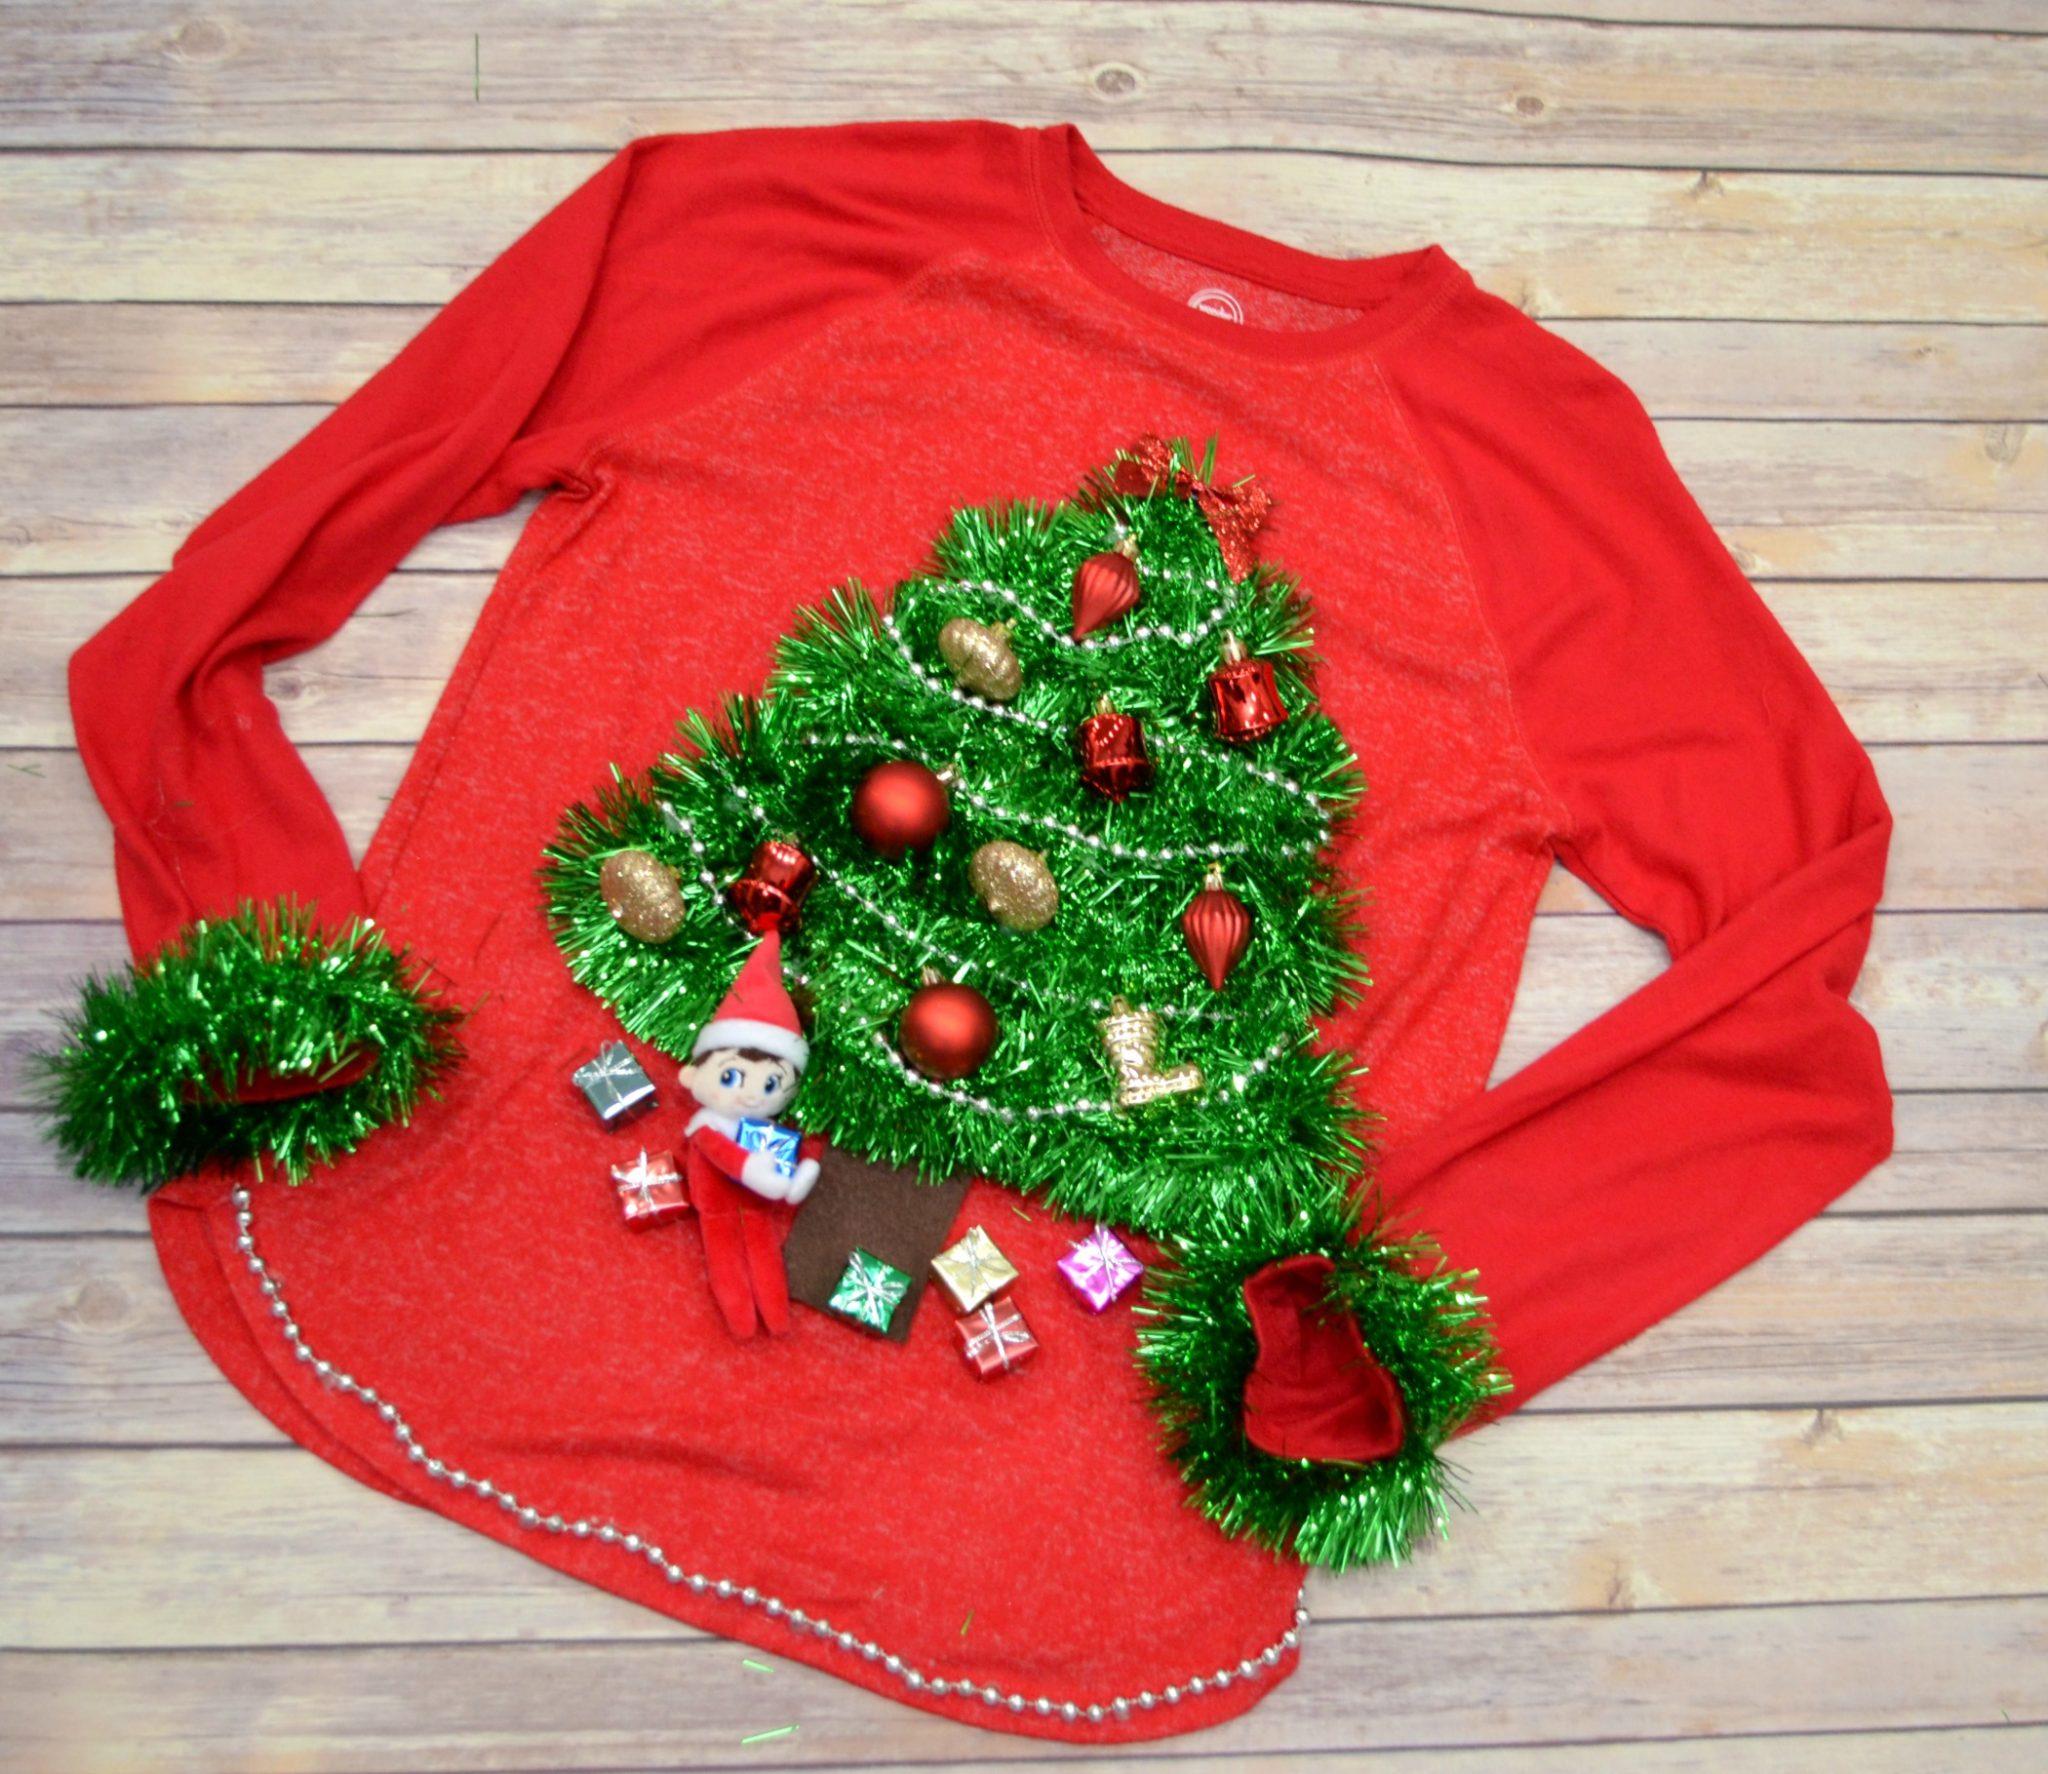 Diy Christmas Tree Sweater: DIY Ugly Sweater: O Christmas Tree